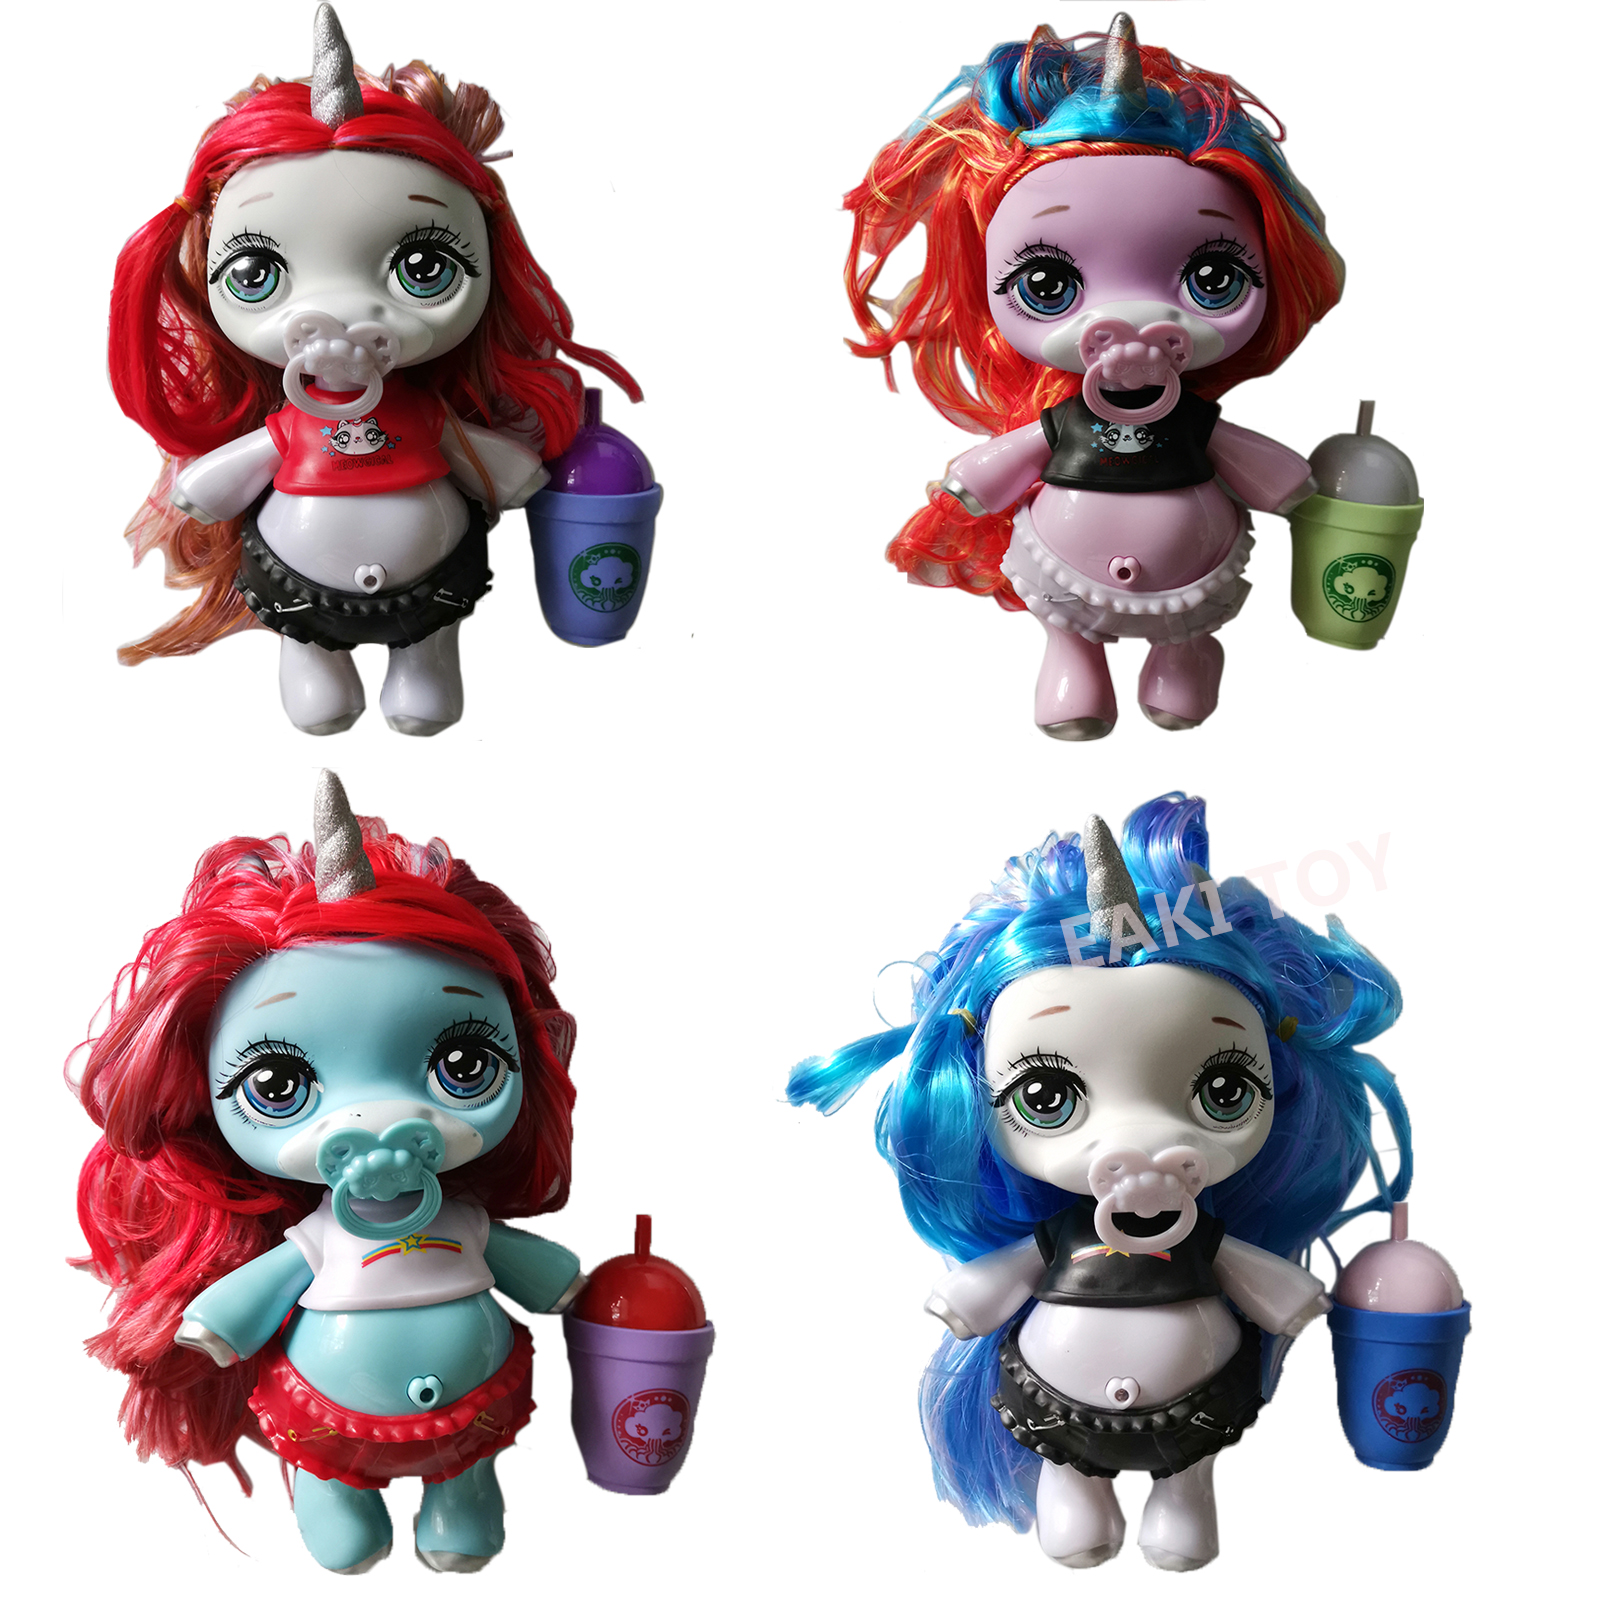 4 стиля, пупси, слизь, большой 27*17 см, единорог, шар, куклы, Пупс, девушки, игрушки, хобби, аксессуары, радуга, яркая звезда, кукла